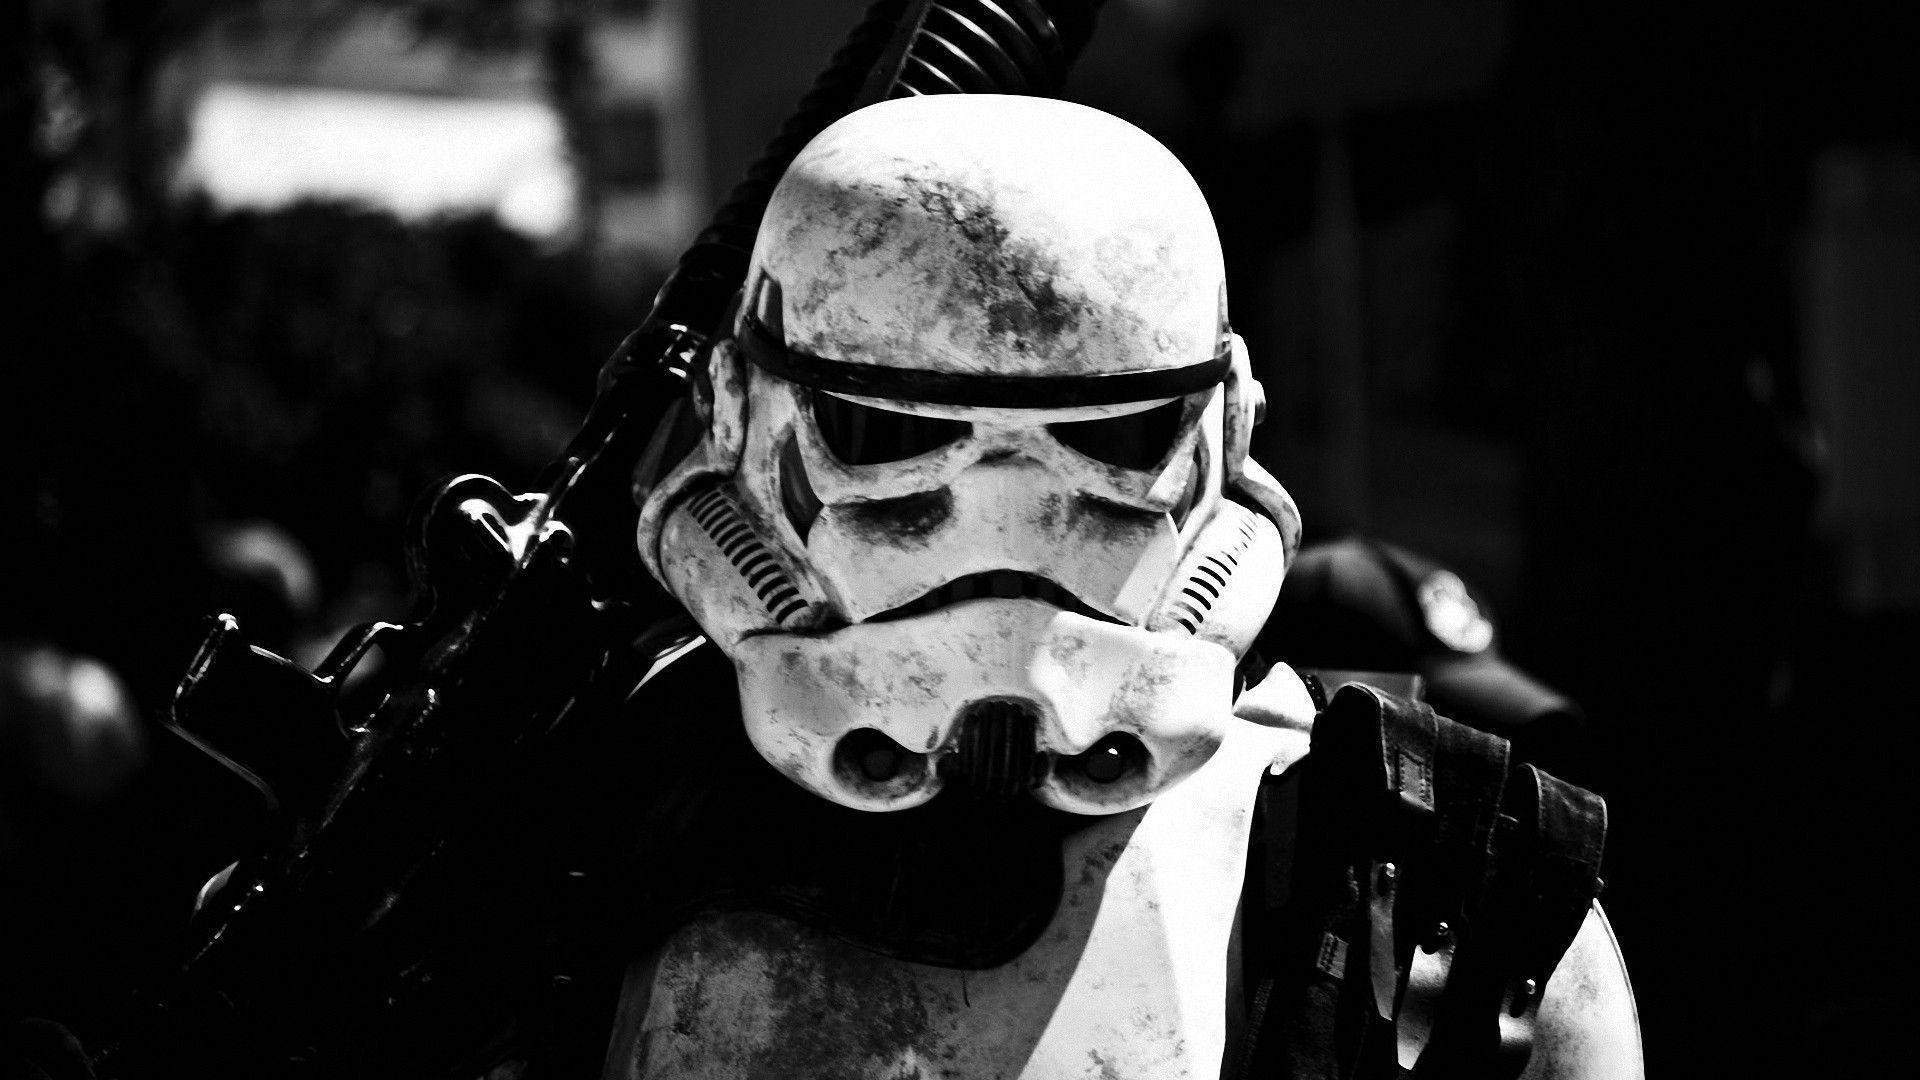 Star Wars Stormtrooper wallpaper 201372